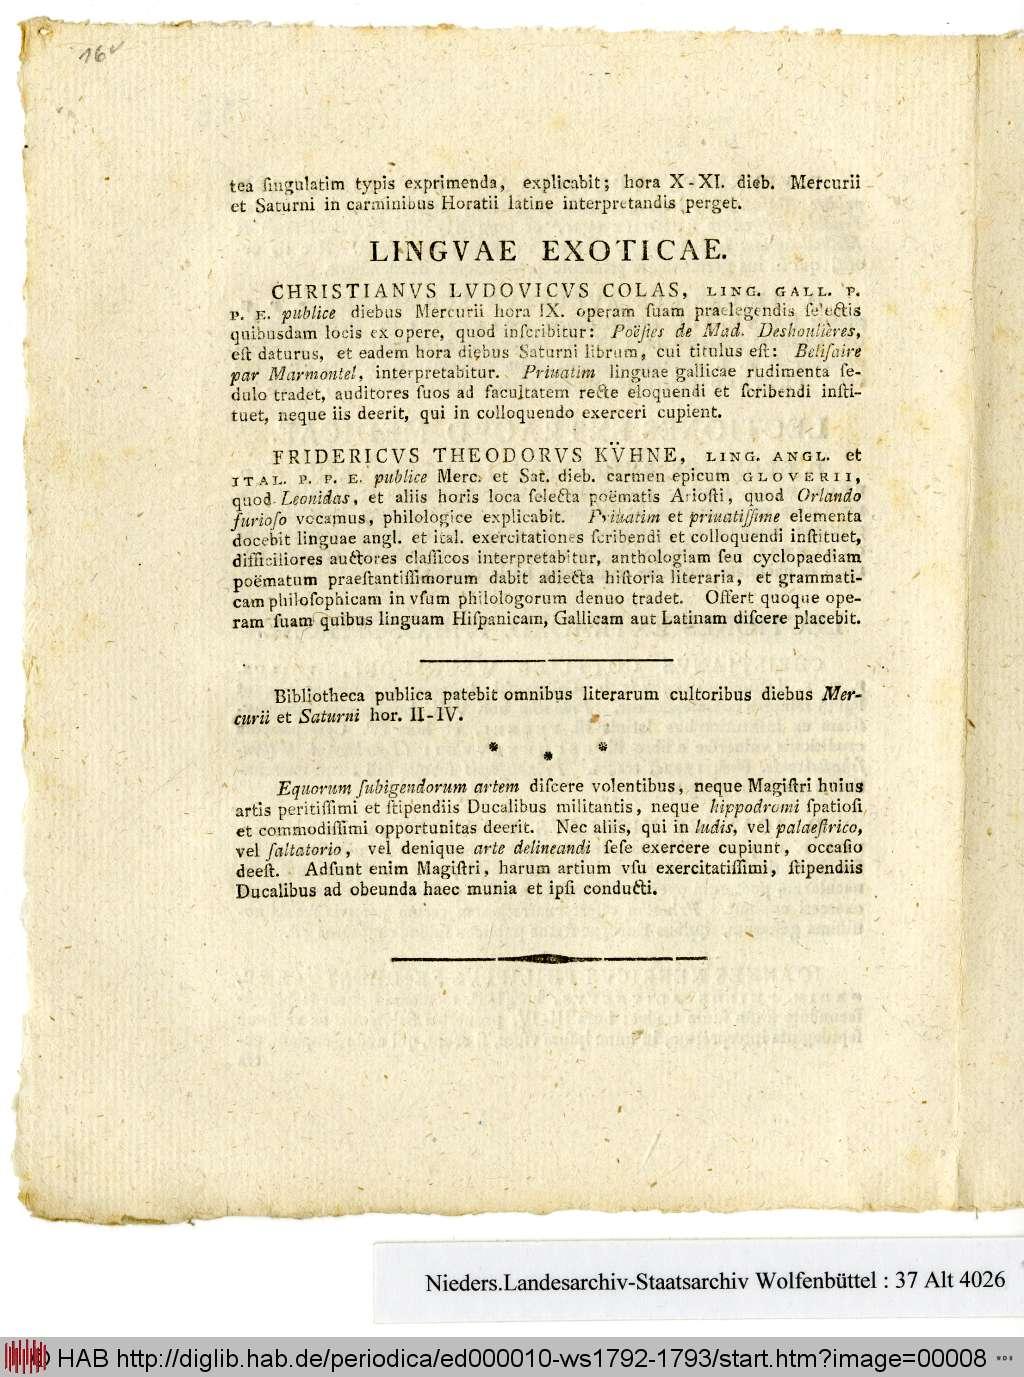 http://diglib.hab.de/periodica/ed000010-ws1792-1793/00008.jpg